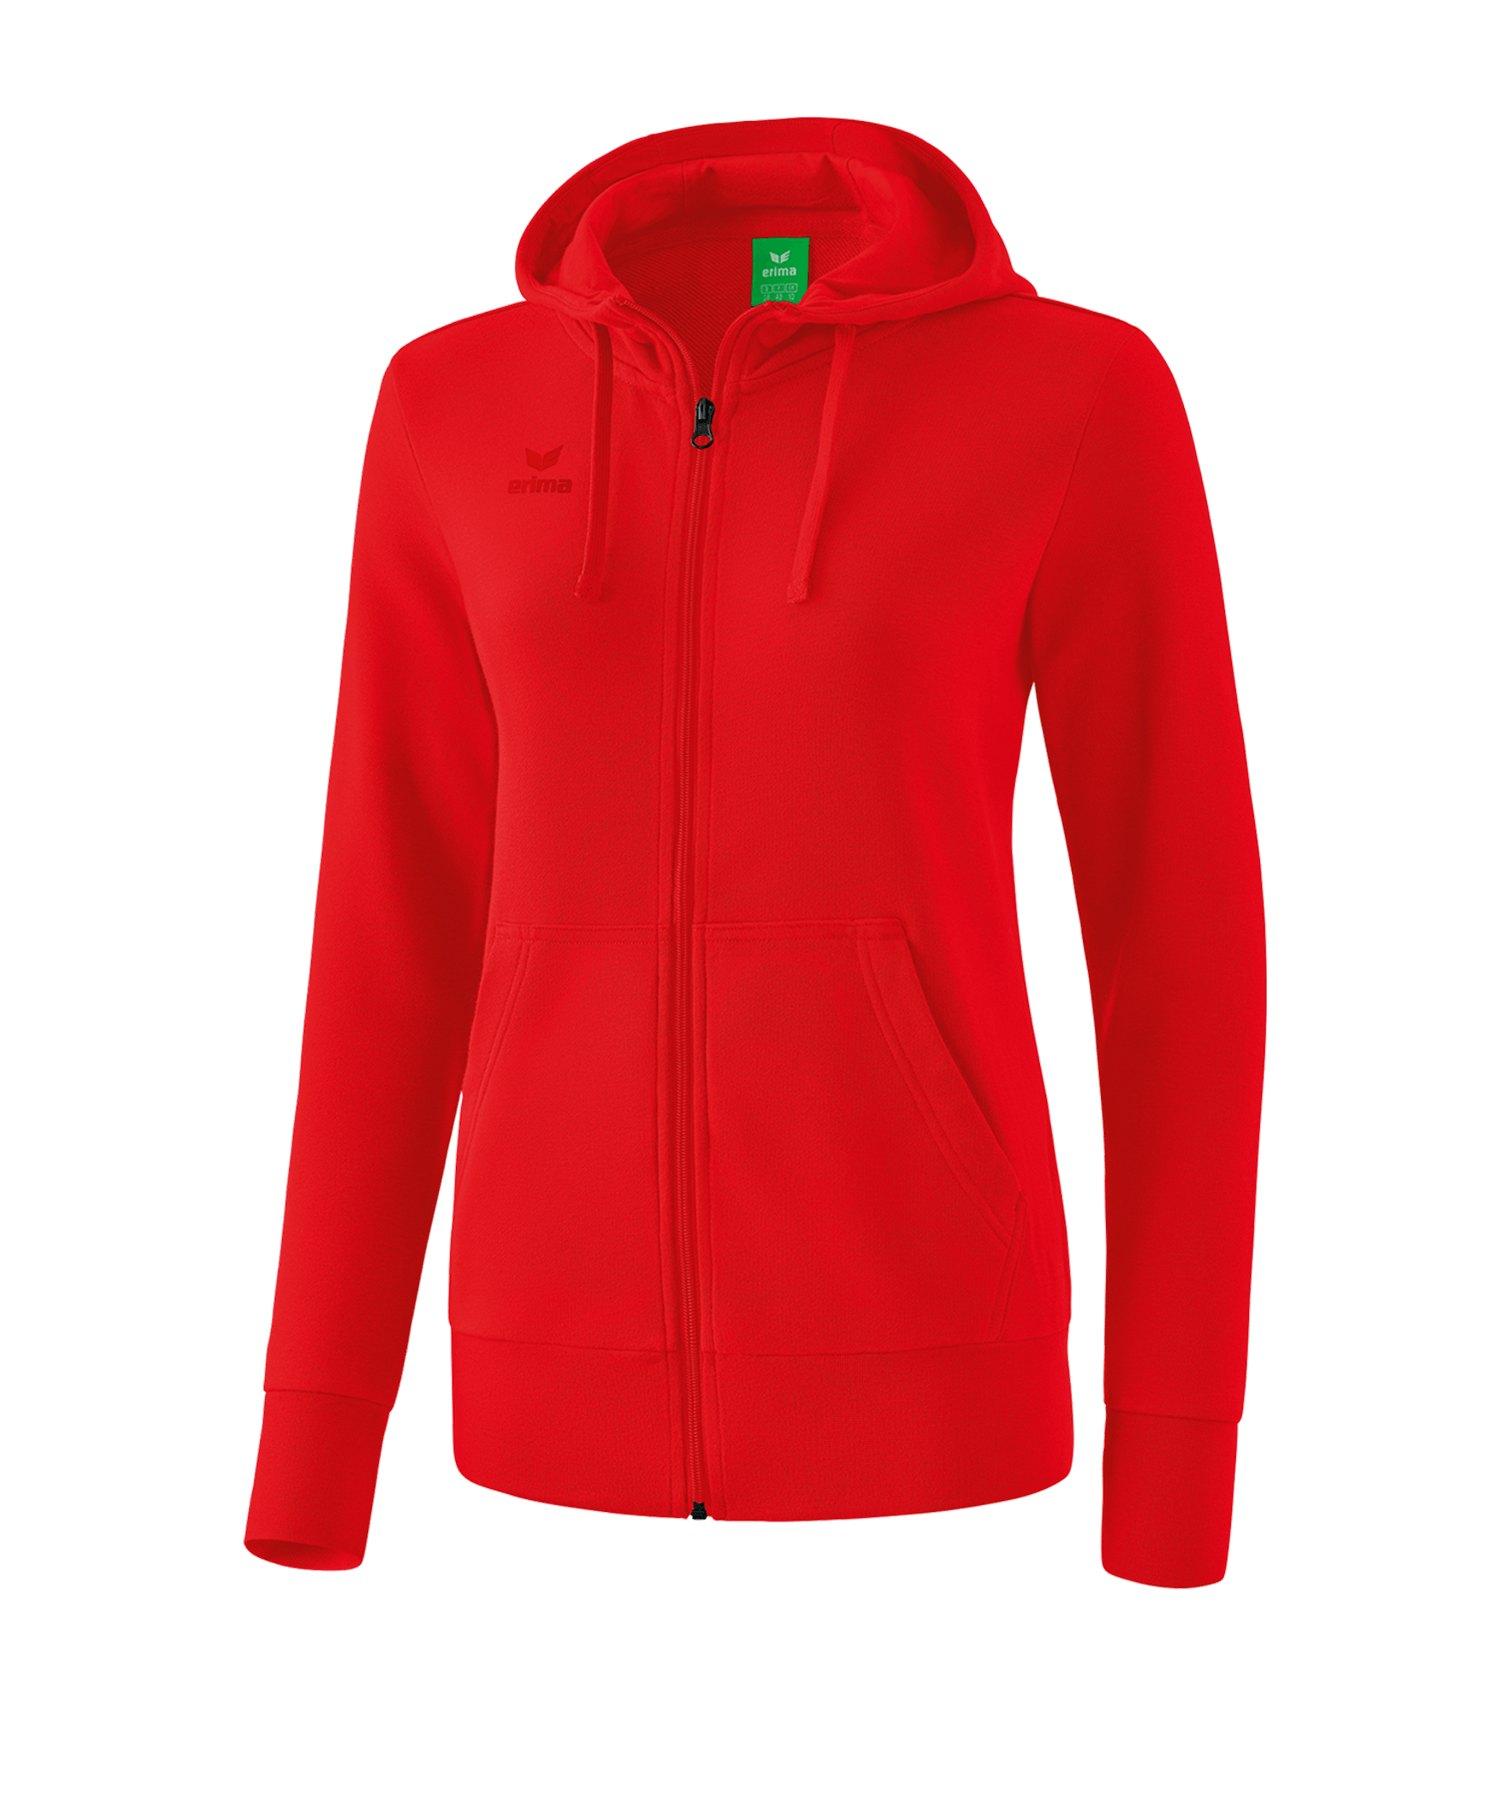 Erima Basic Kapuzenjacke Damen Rot - rot